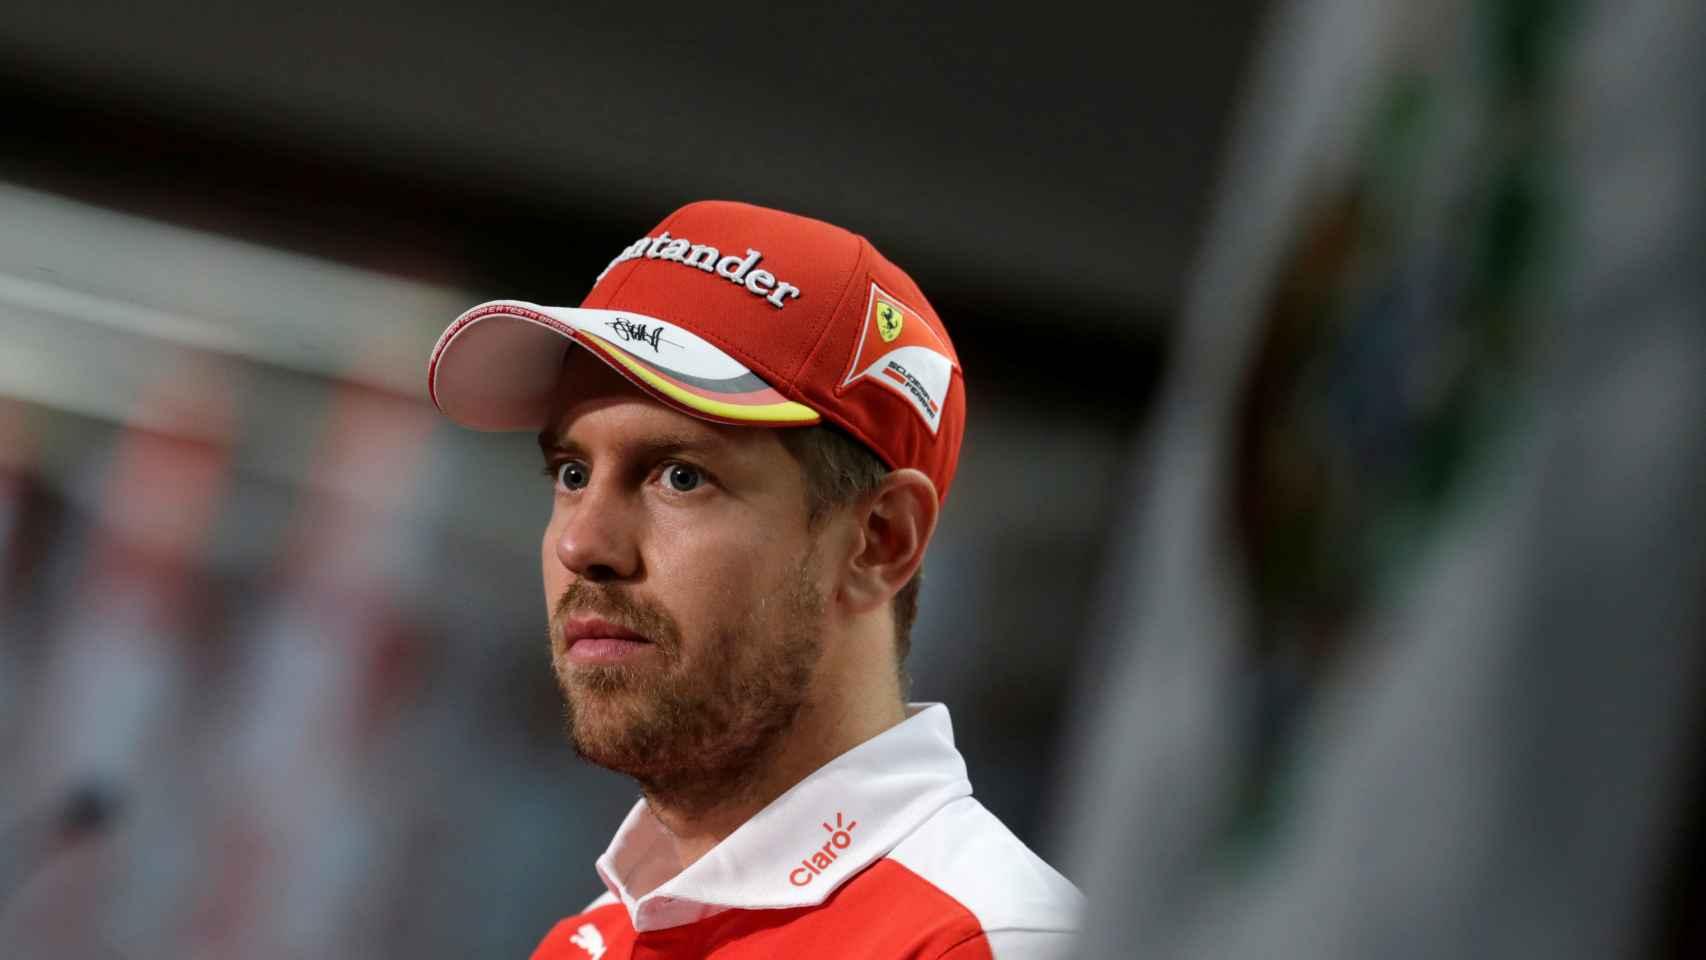 Sebastian Vettel, en la rueda de prensa posterior al GP de México.